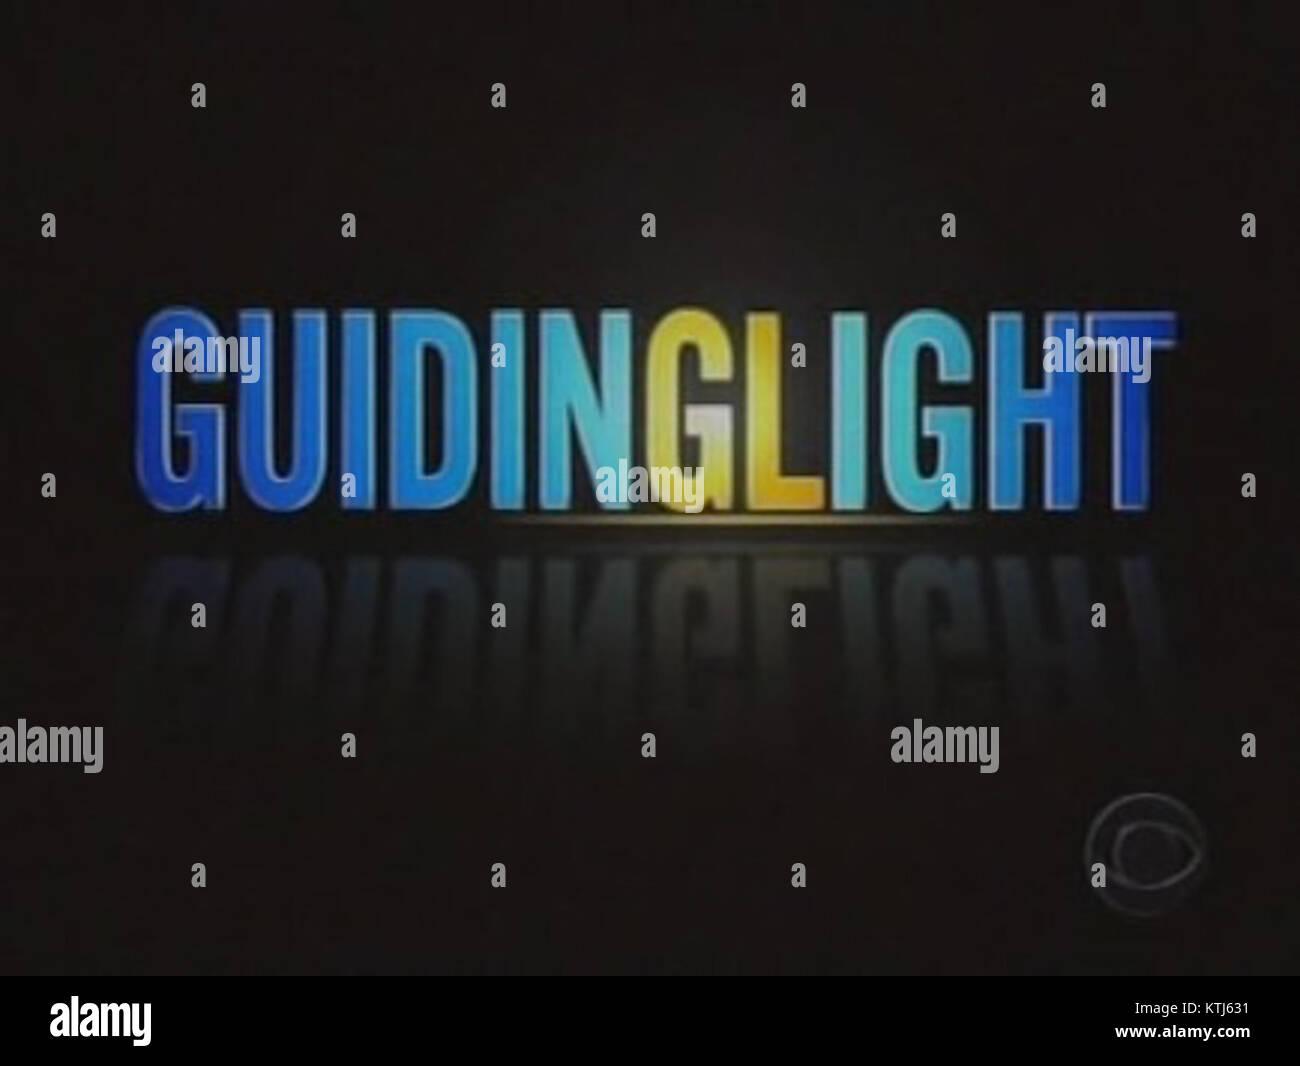 Guiding Light final logo - Stock Image